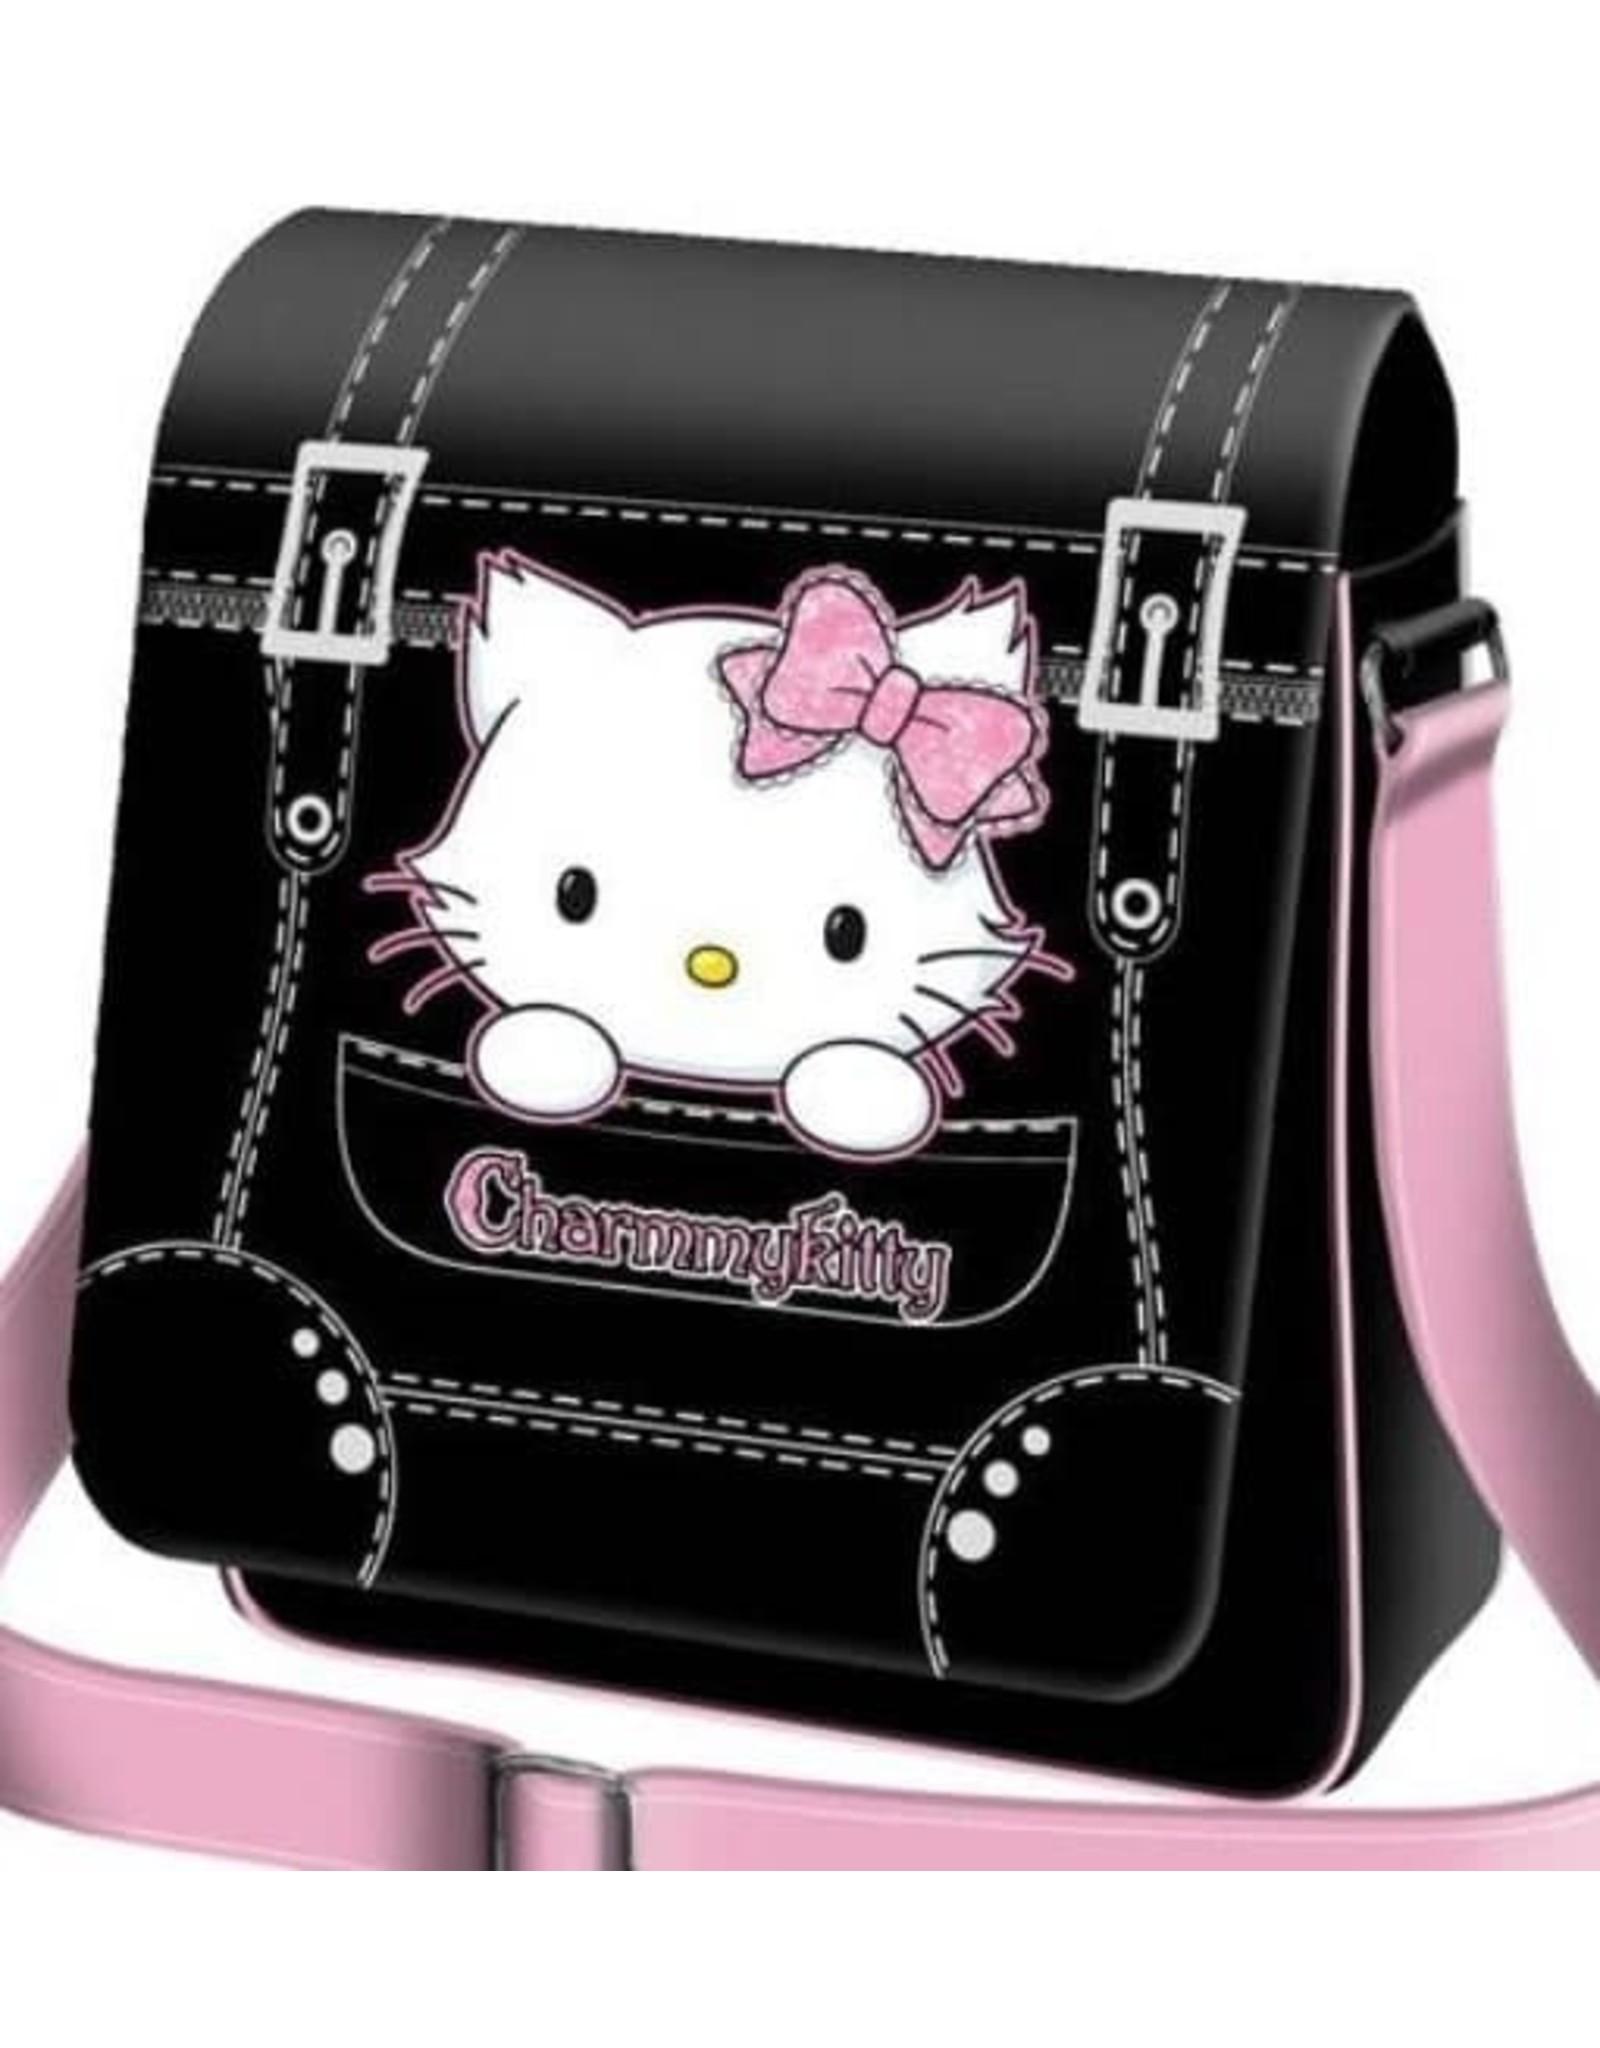 Charmmy Kitty Merchandise tassen - Charmmy Kitty schoudertas 3